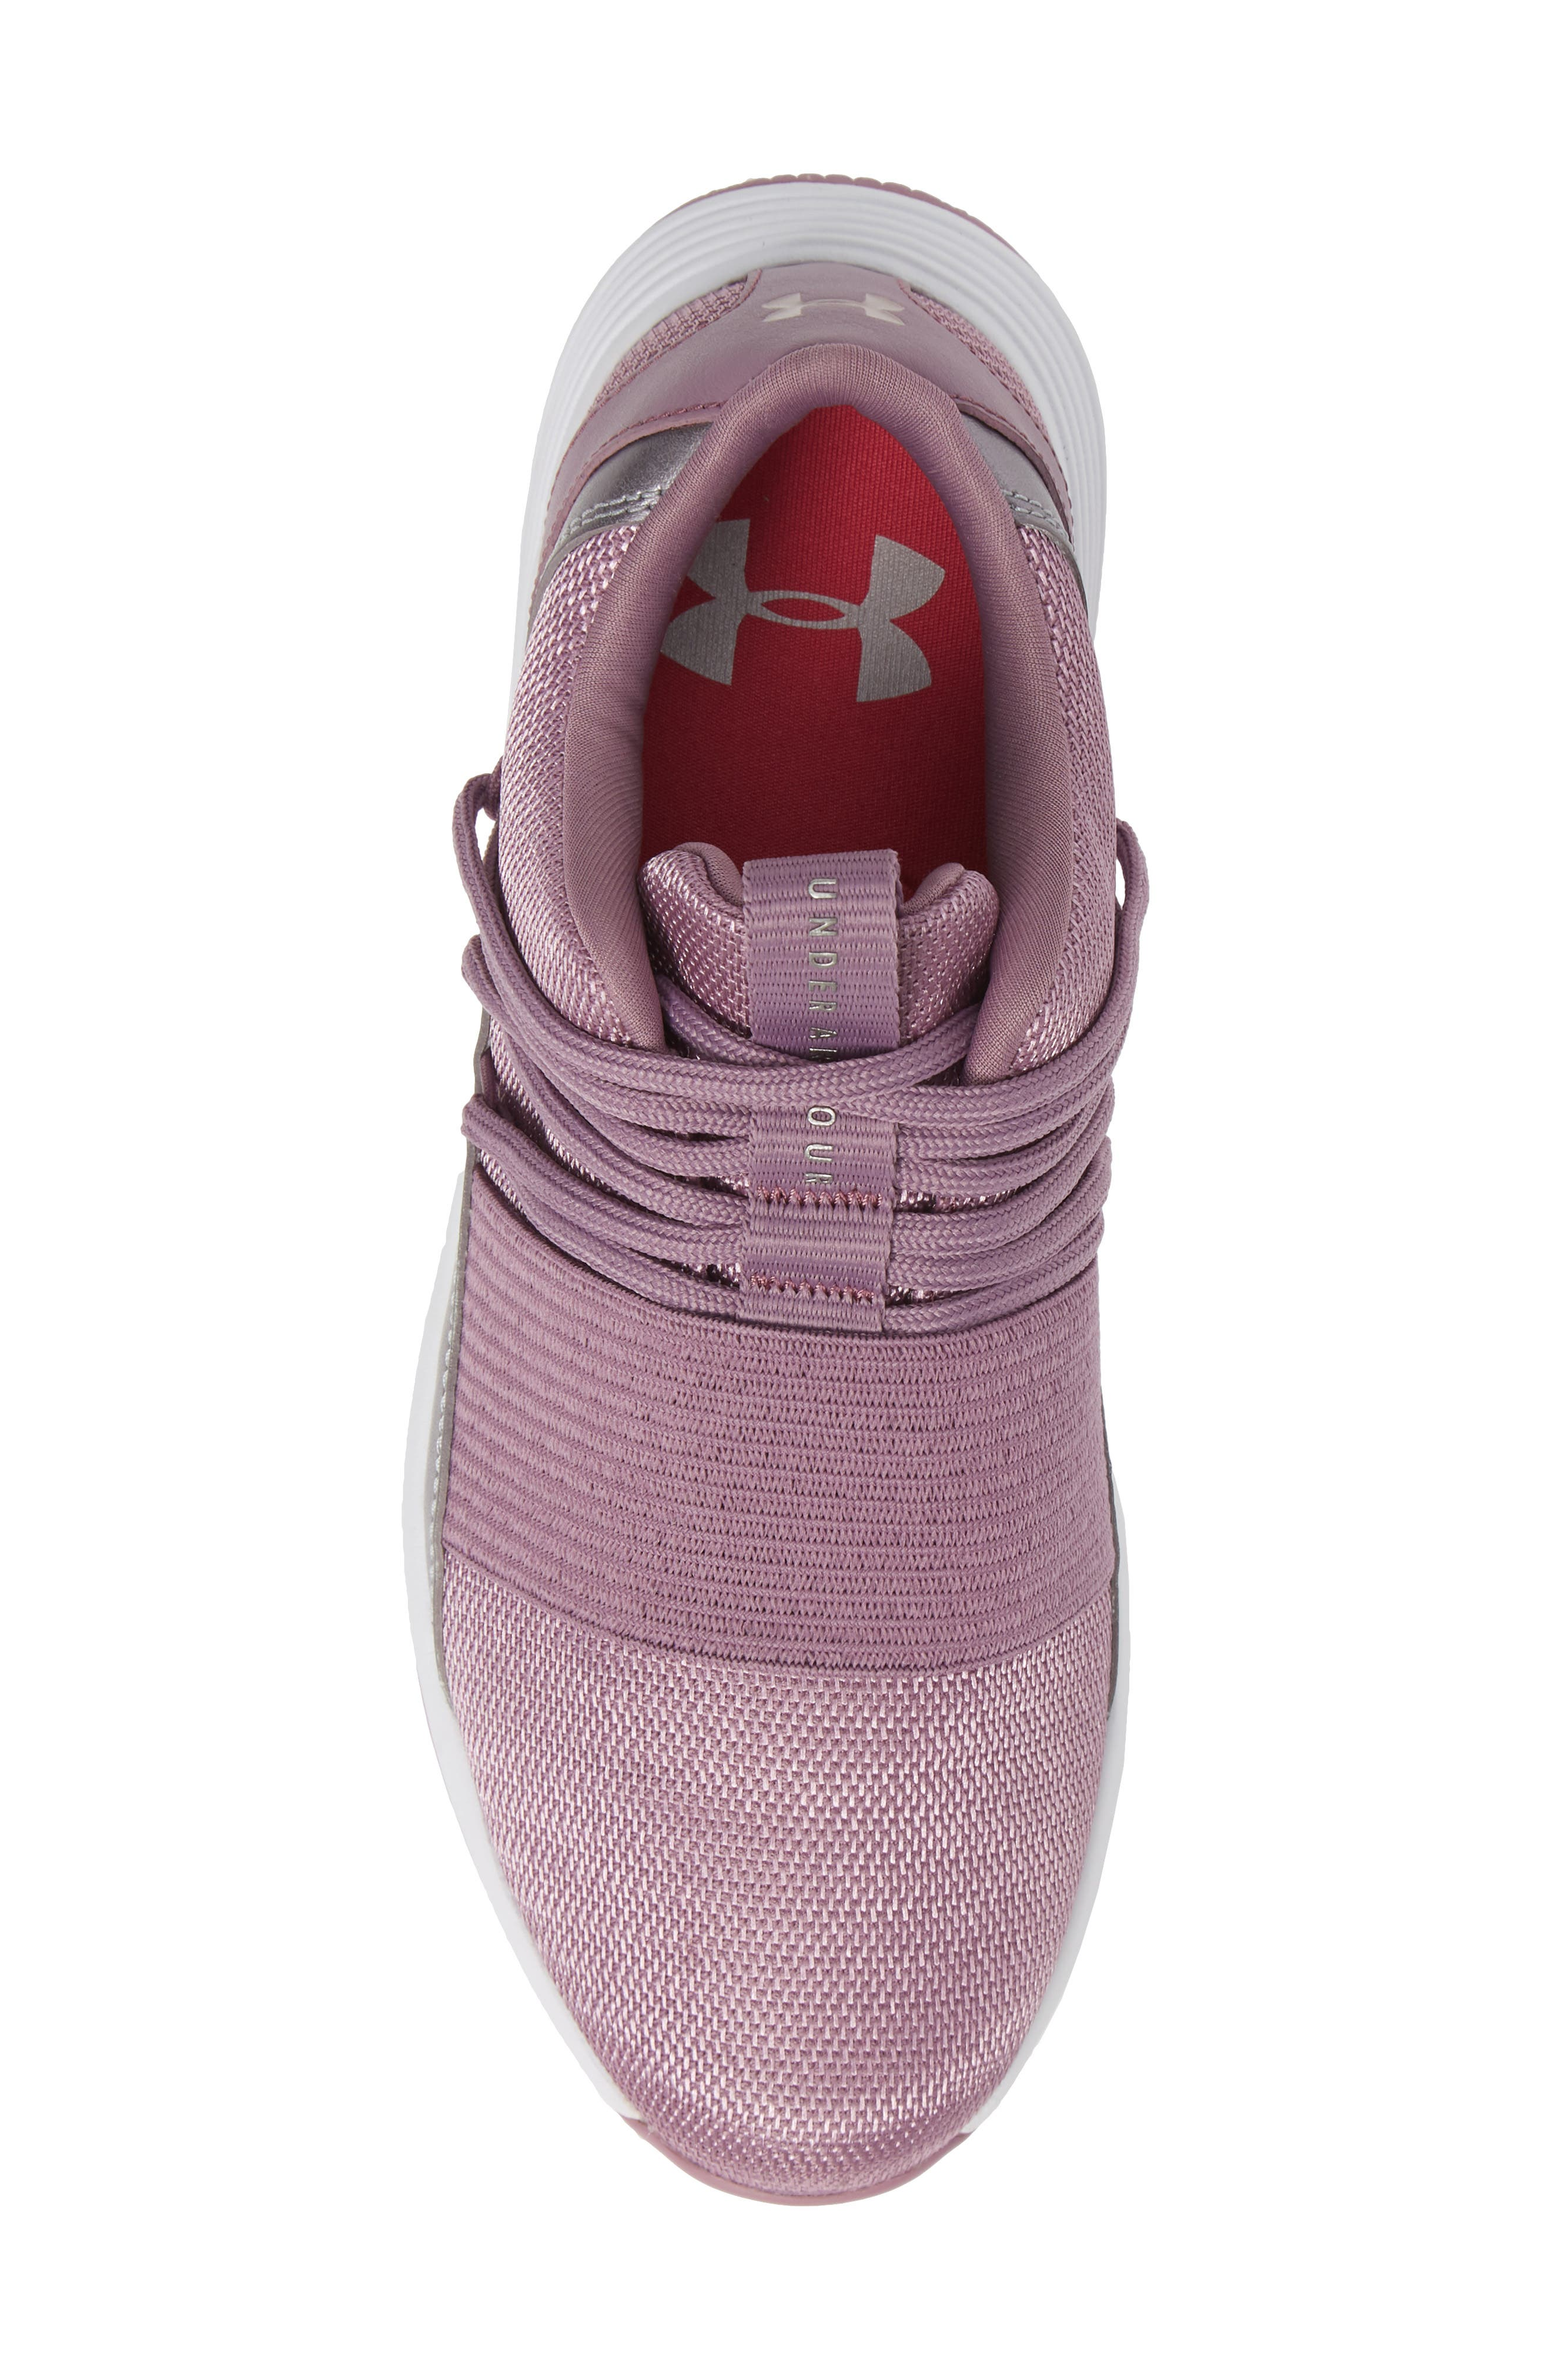 Breathe Lace X NM Sneaker,                             Alternate thumbnail 5, color,                             PURPLE PRIME/ WHITE/ WHITE